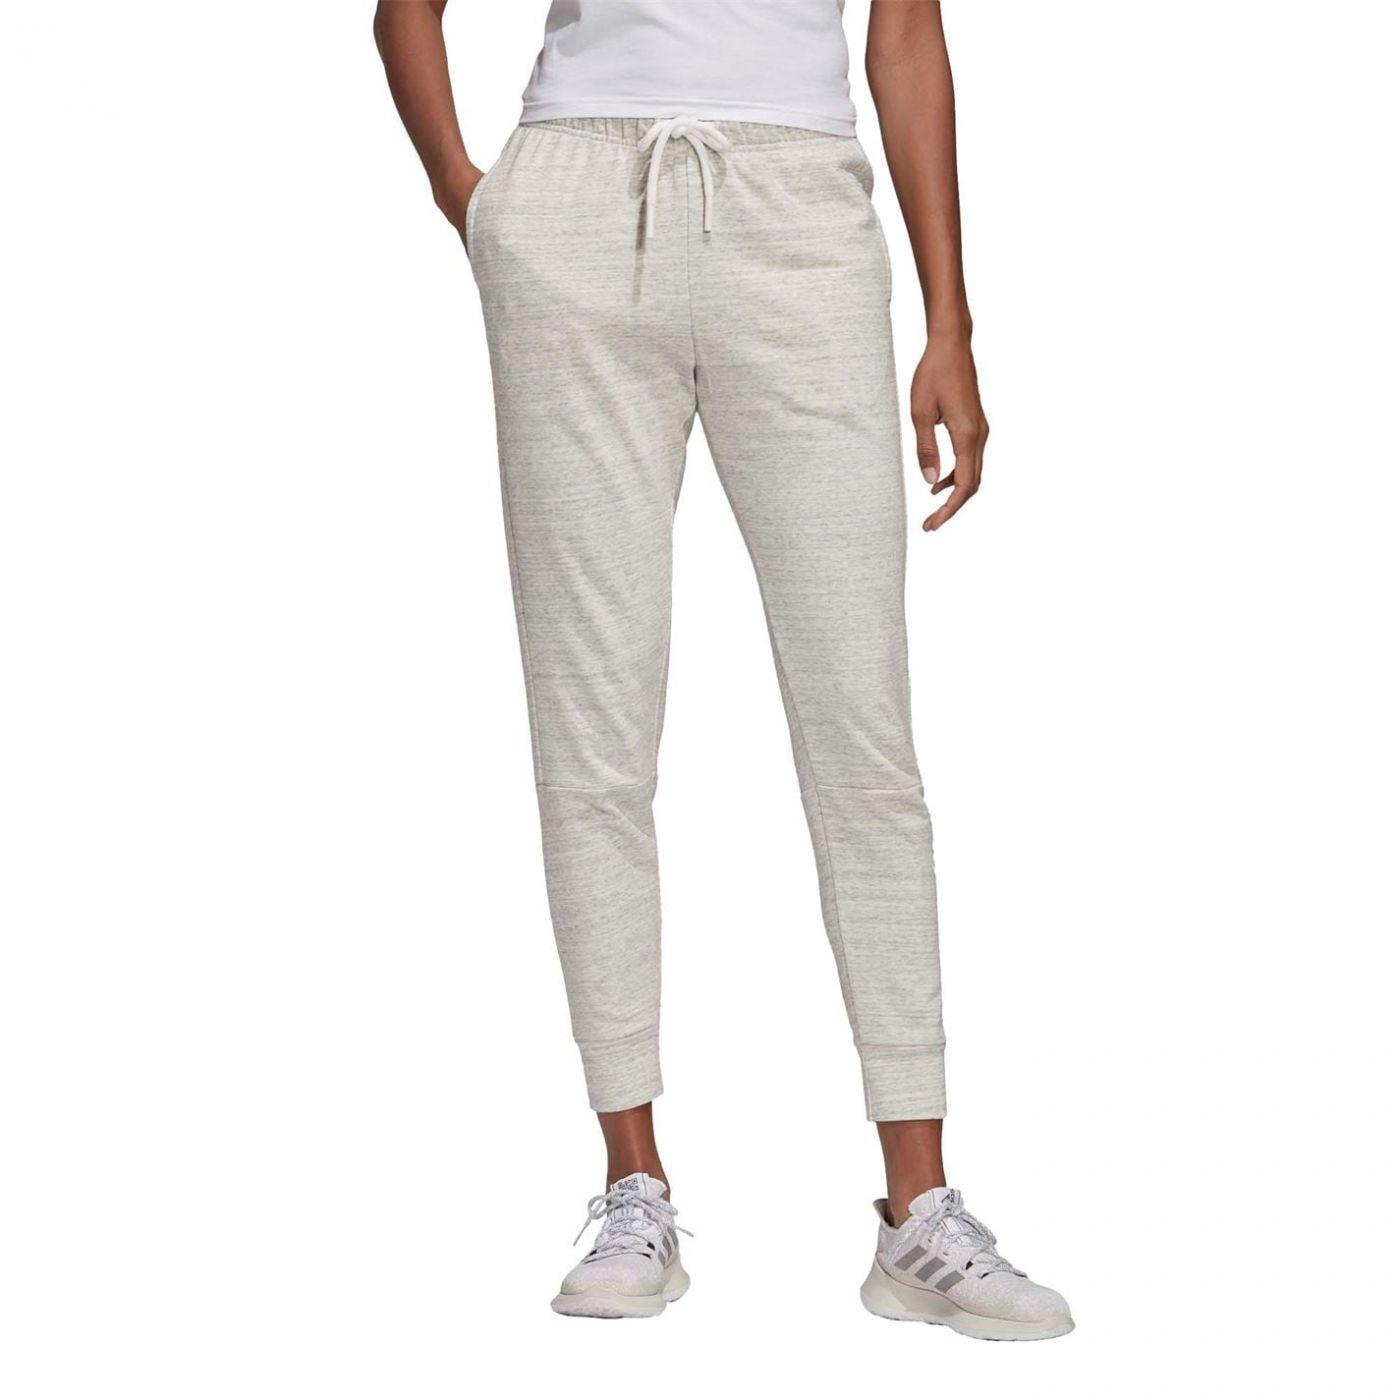 Adidas Melange Pants Ladies